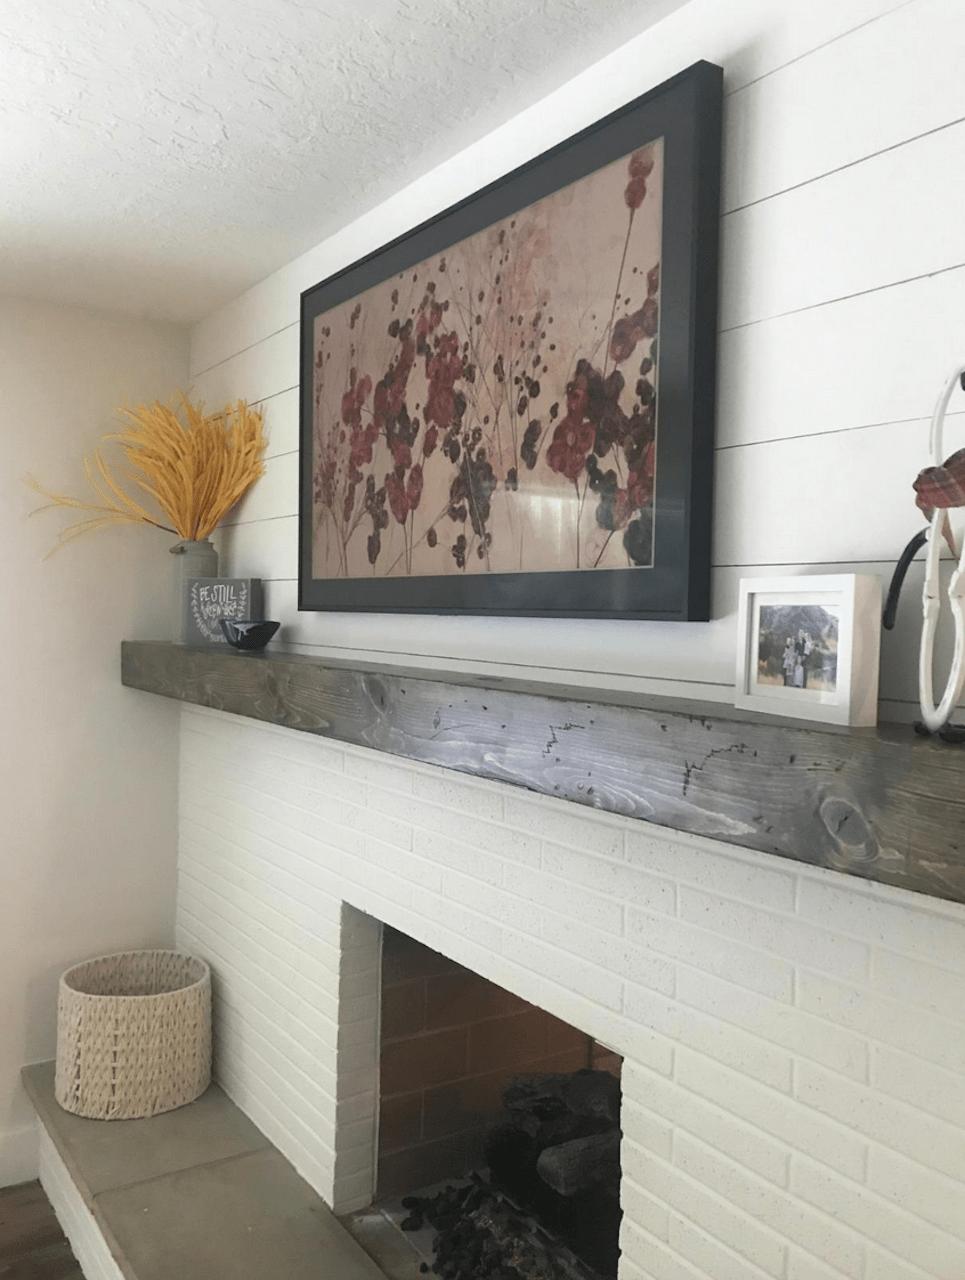 Samsung Frame TV over brick fireplace